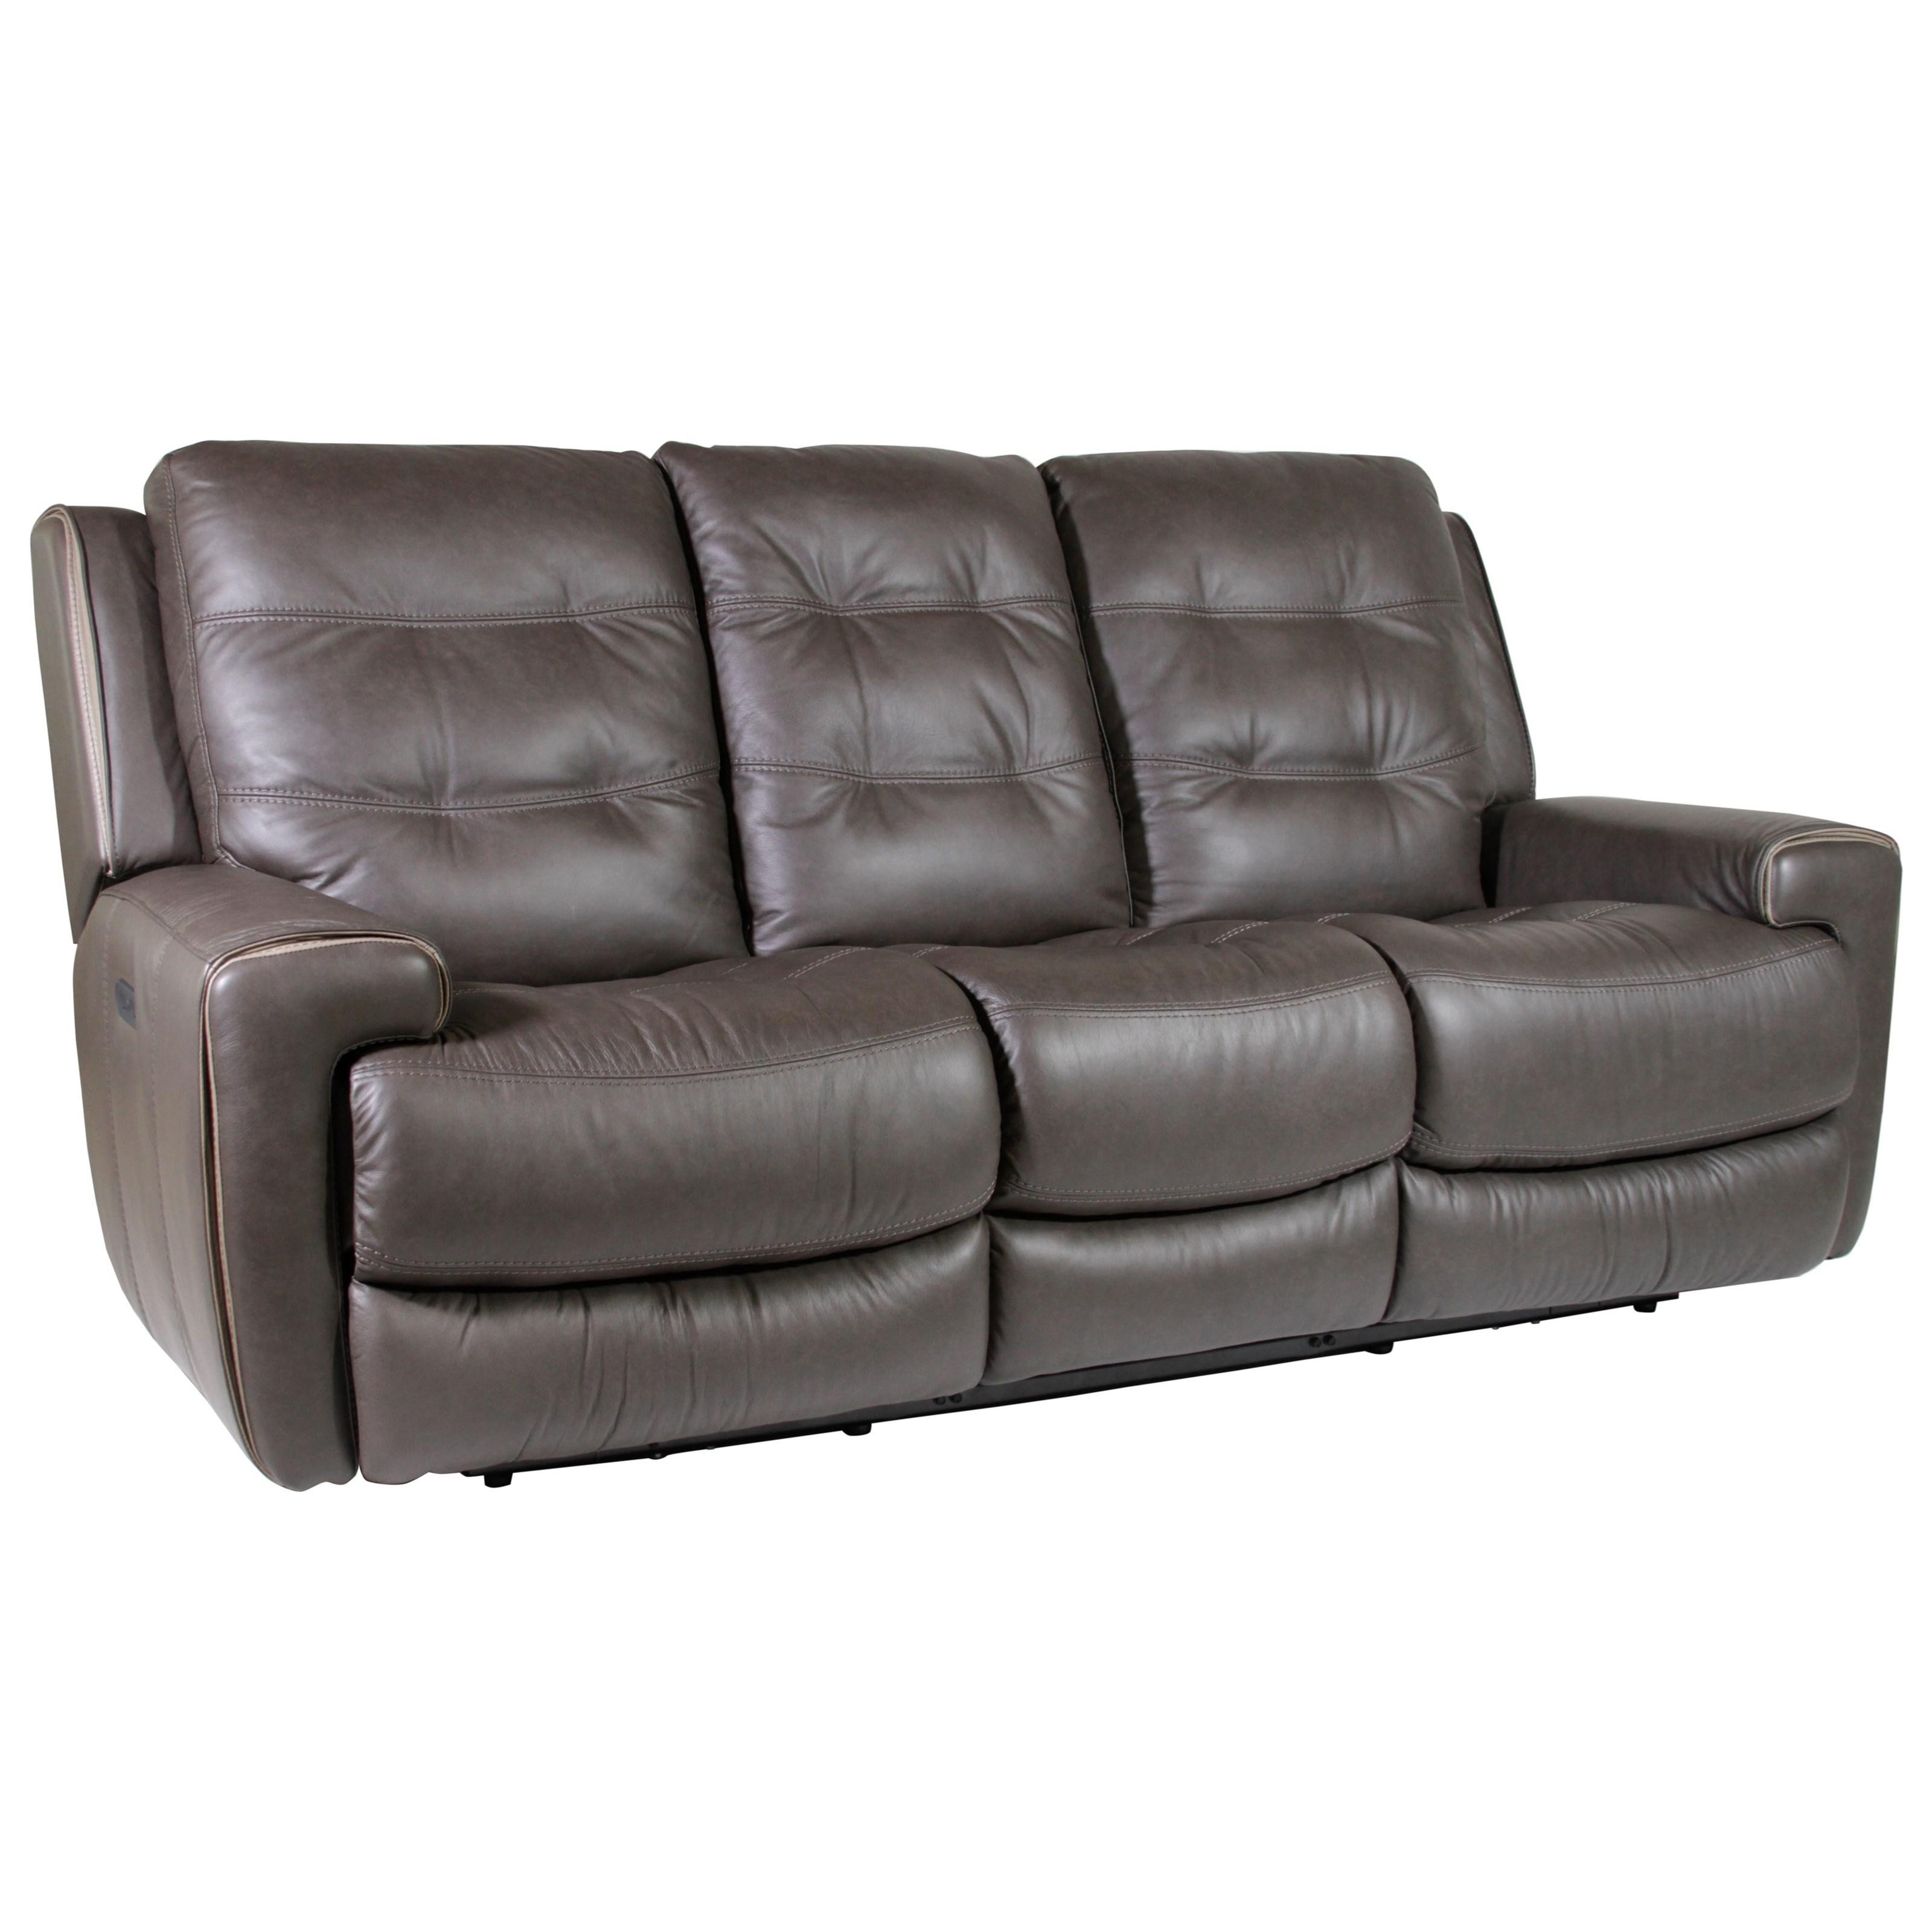 Flexsteel Latitudes Wicklow Power Reclining Lay Flat Sofa